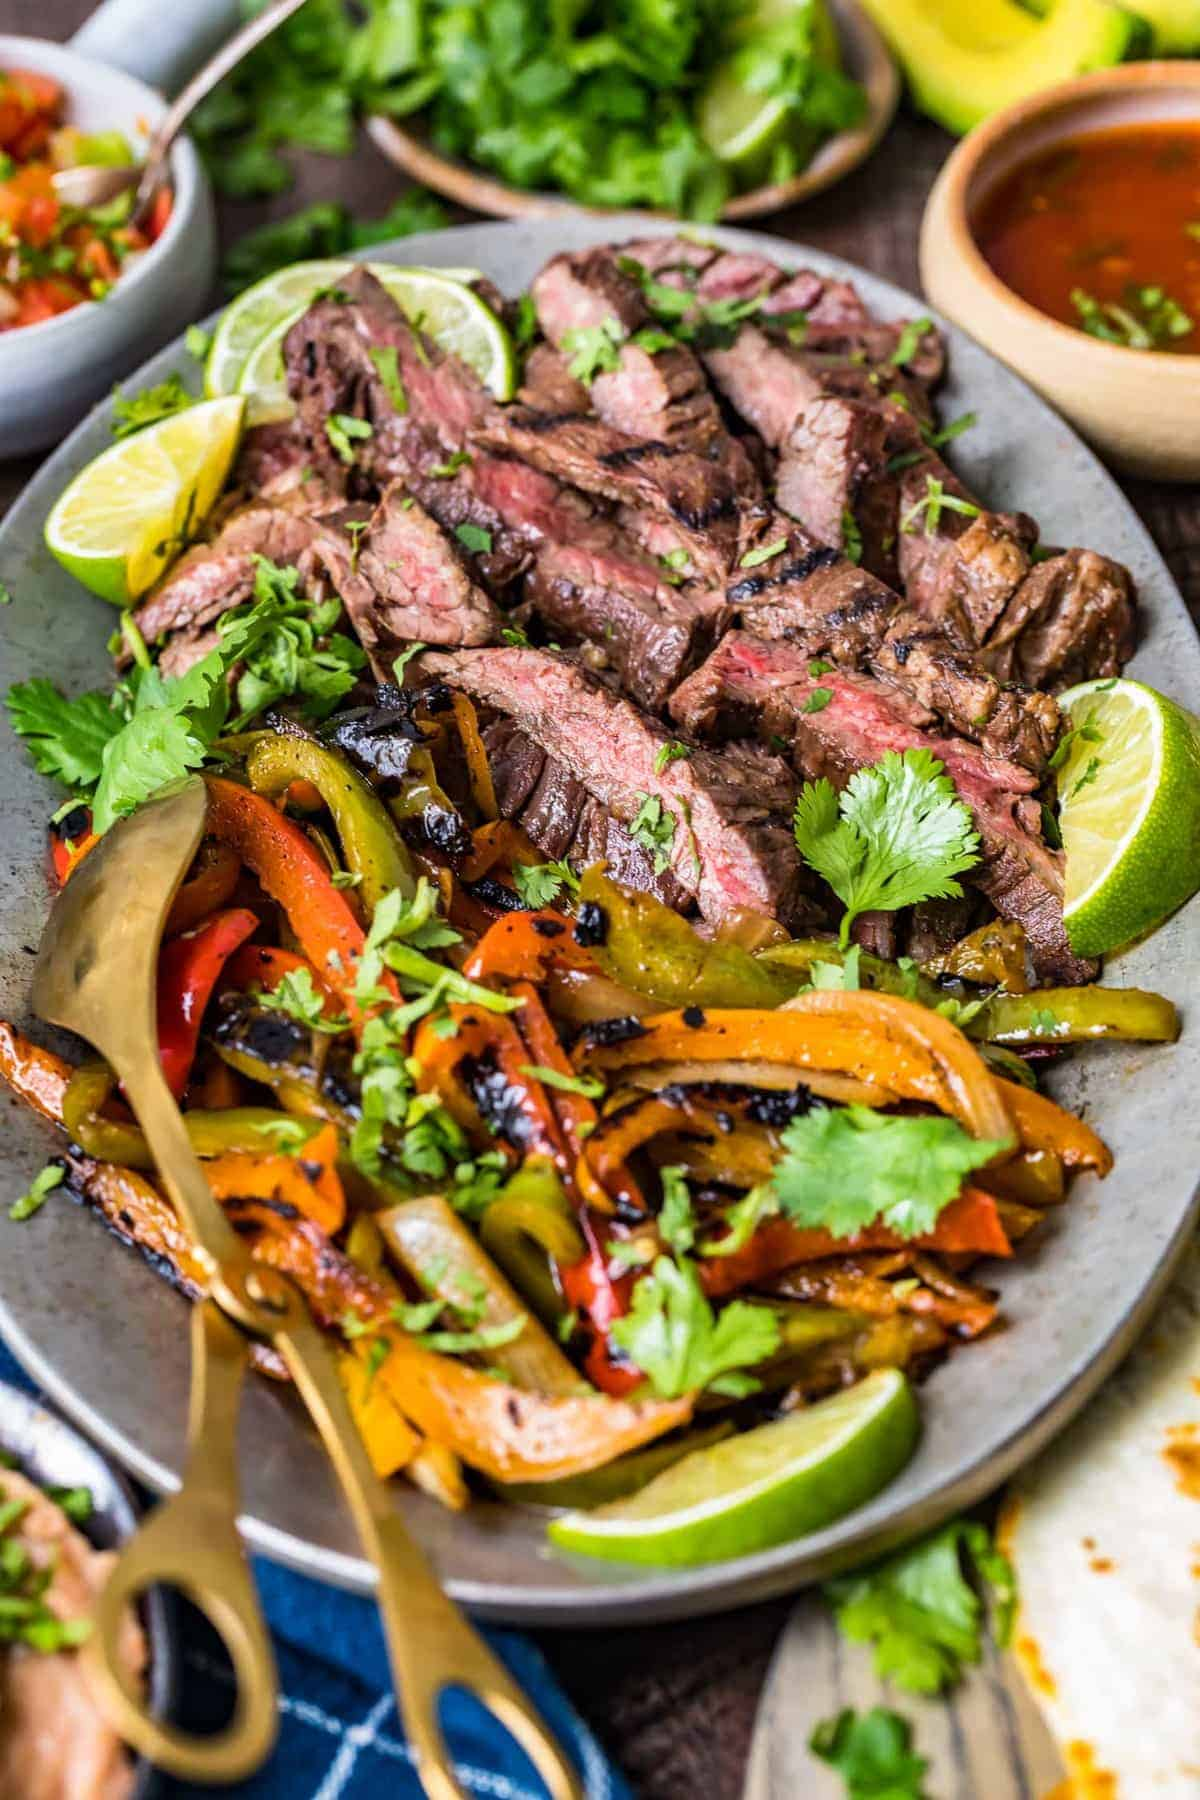 Steak fajitas ready to serve